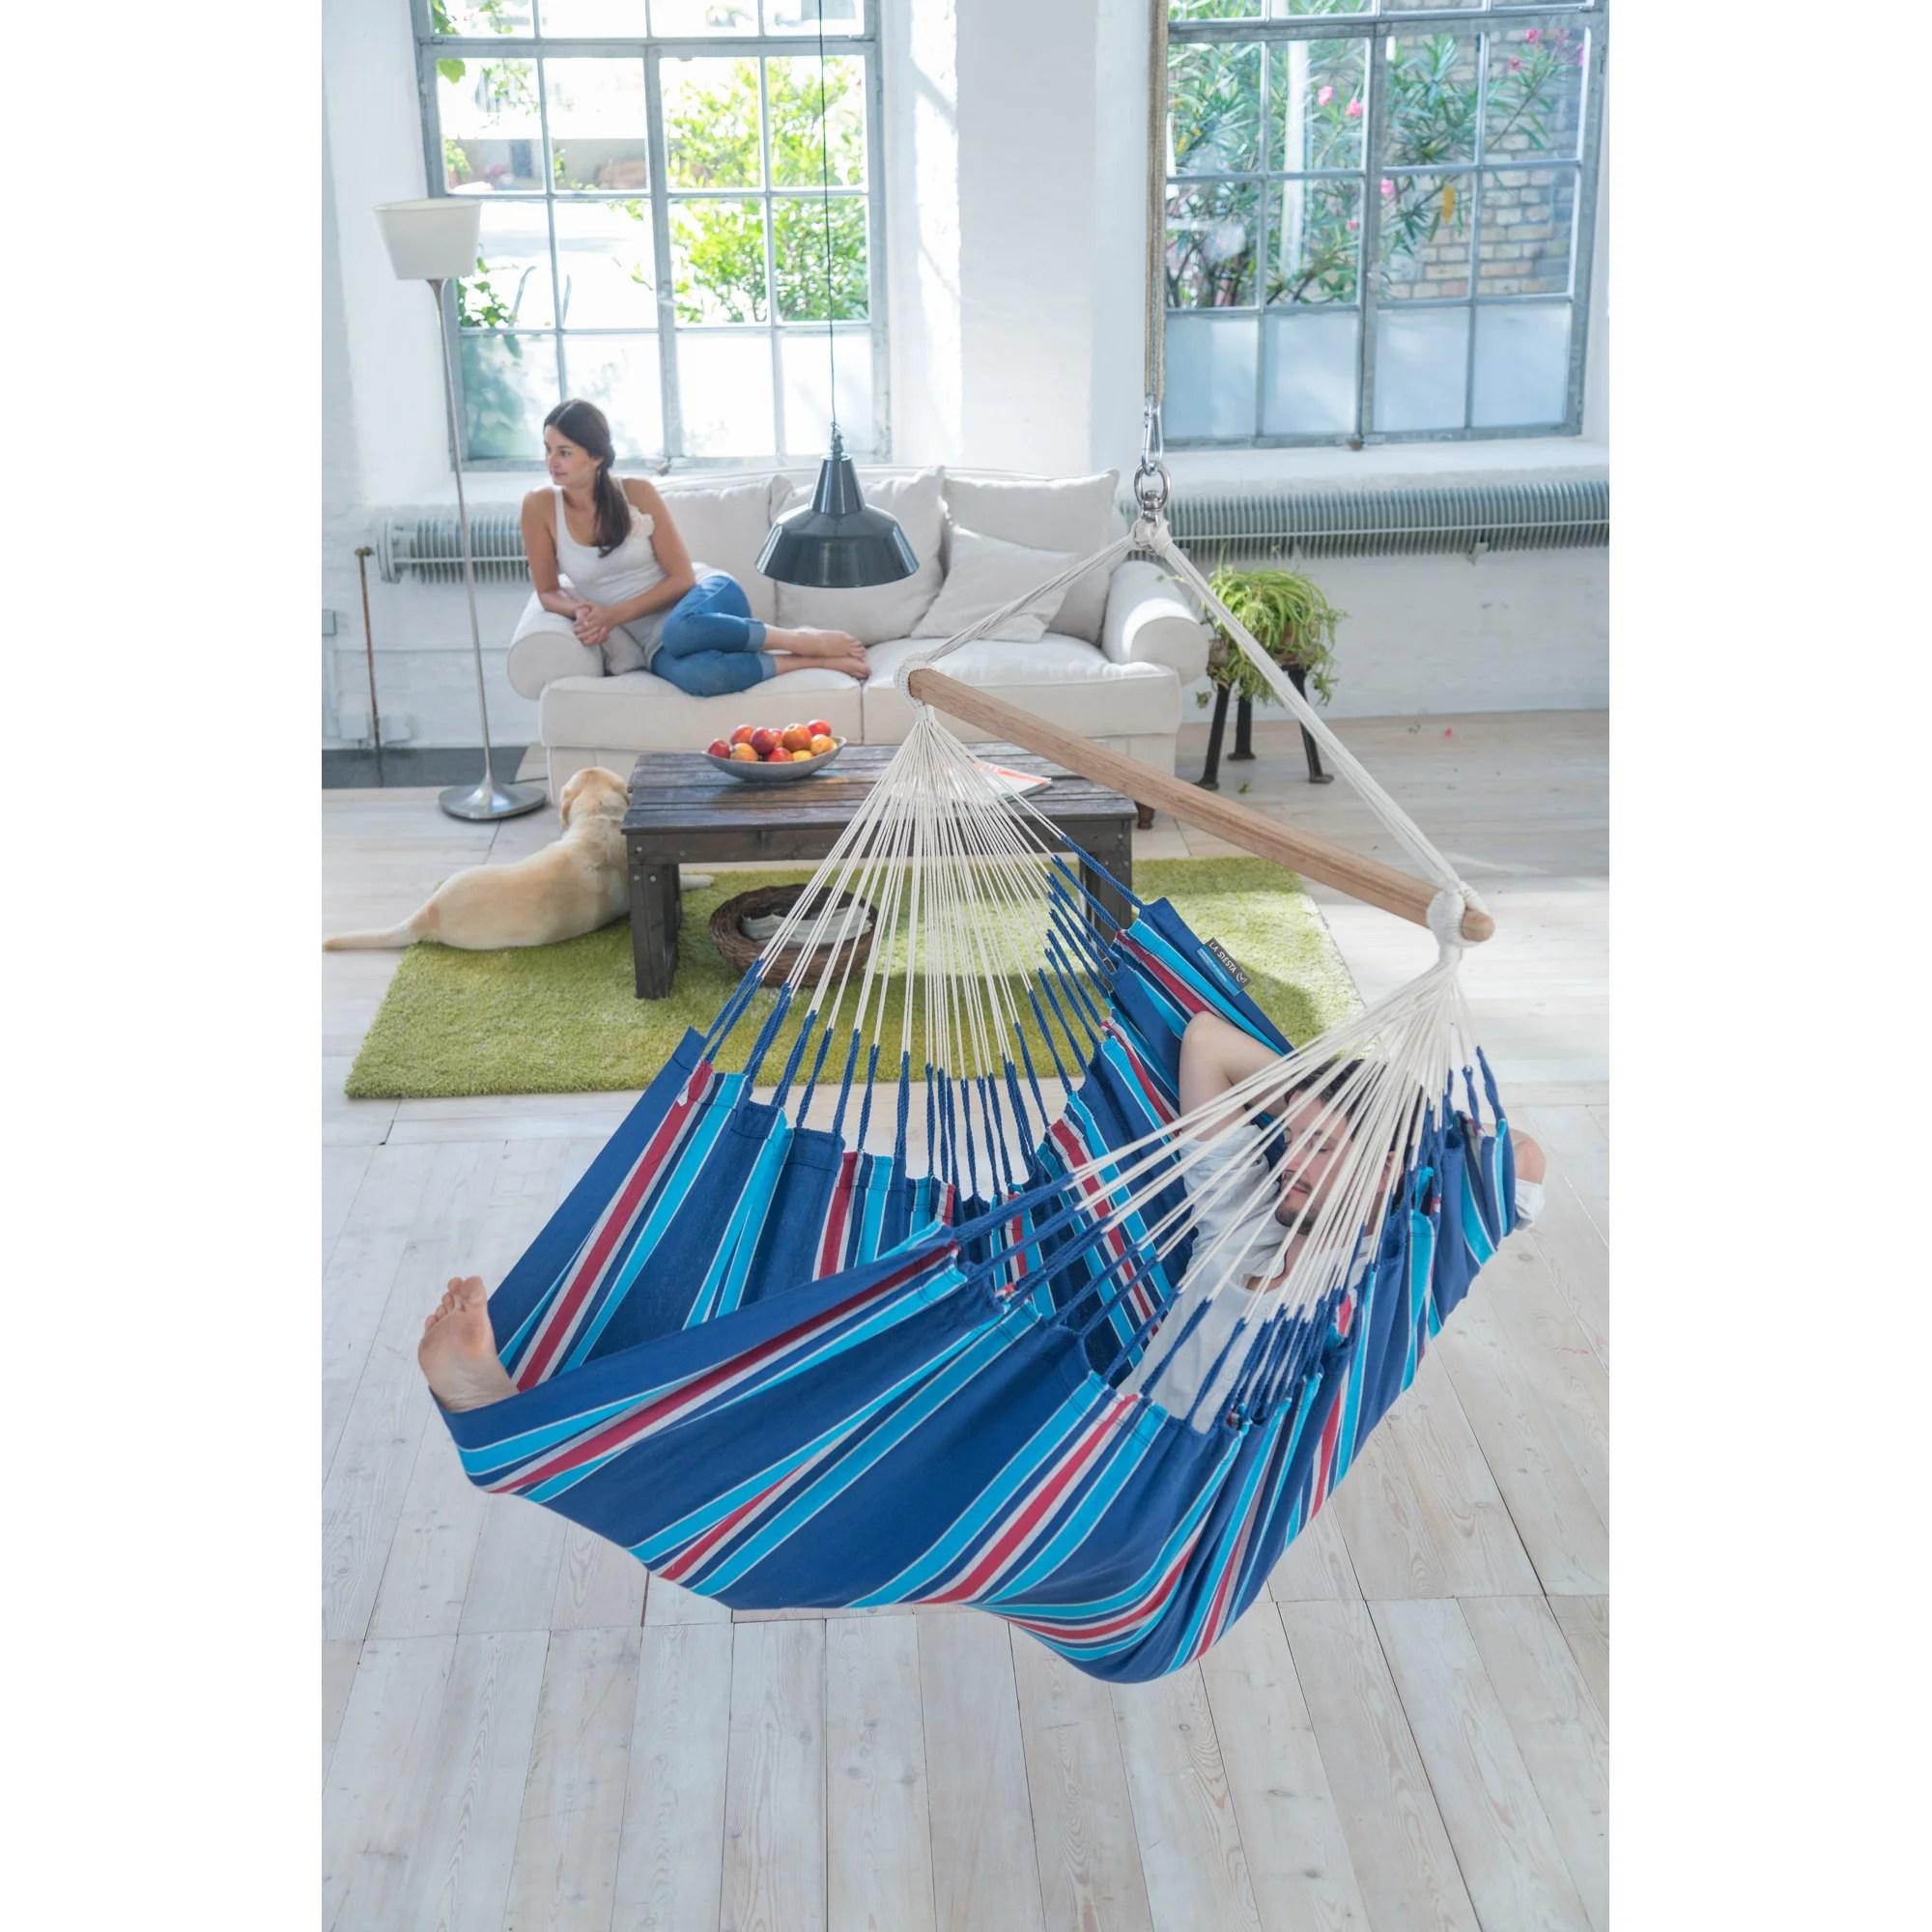 la siesta hammock chair little rocking song currambera lounger wayfair